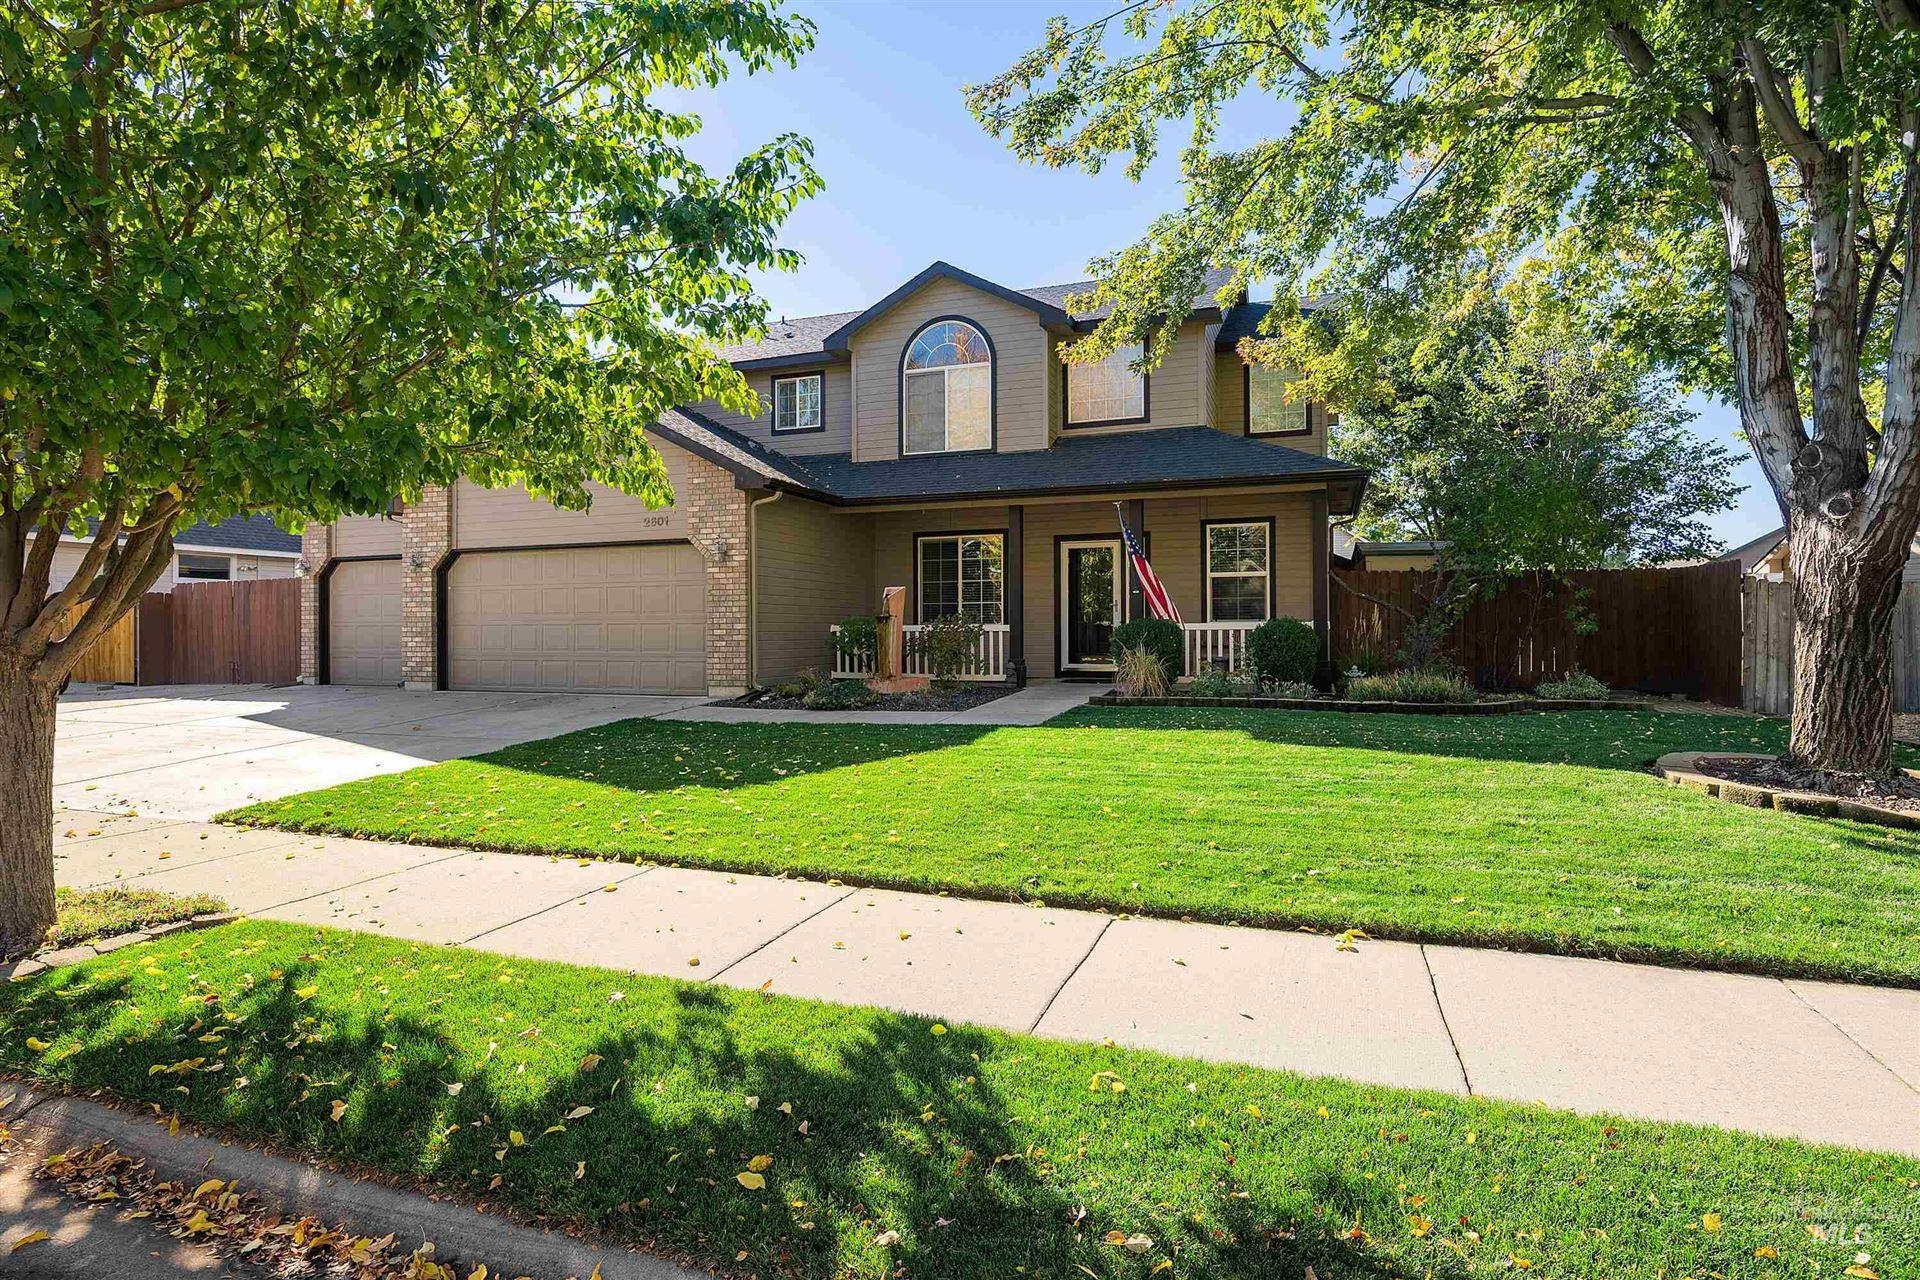 2601 E Green Canyon Drive, Meridian, ID 83642 - MLS#: 98821525